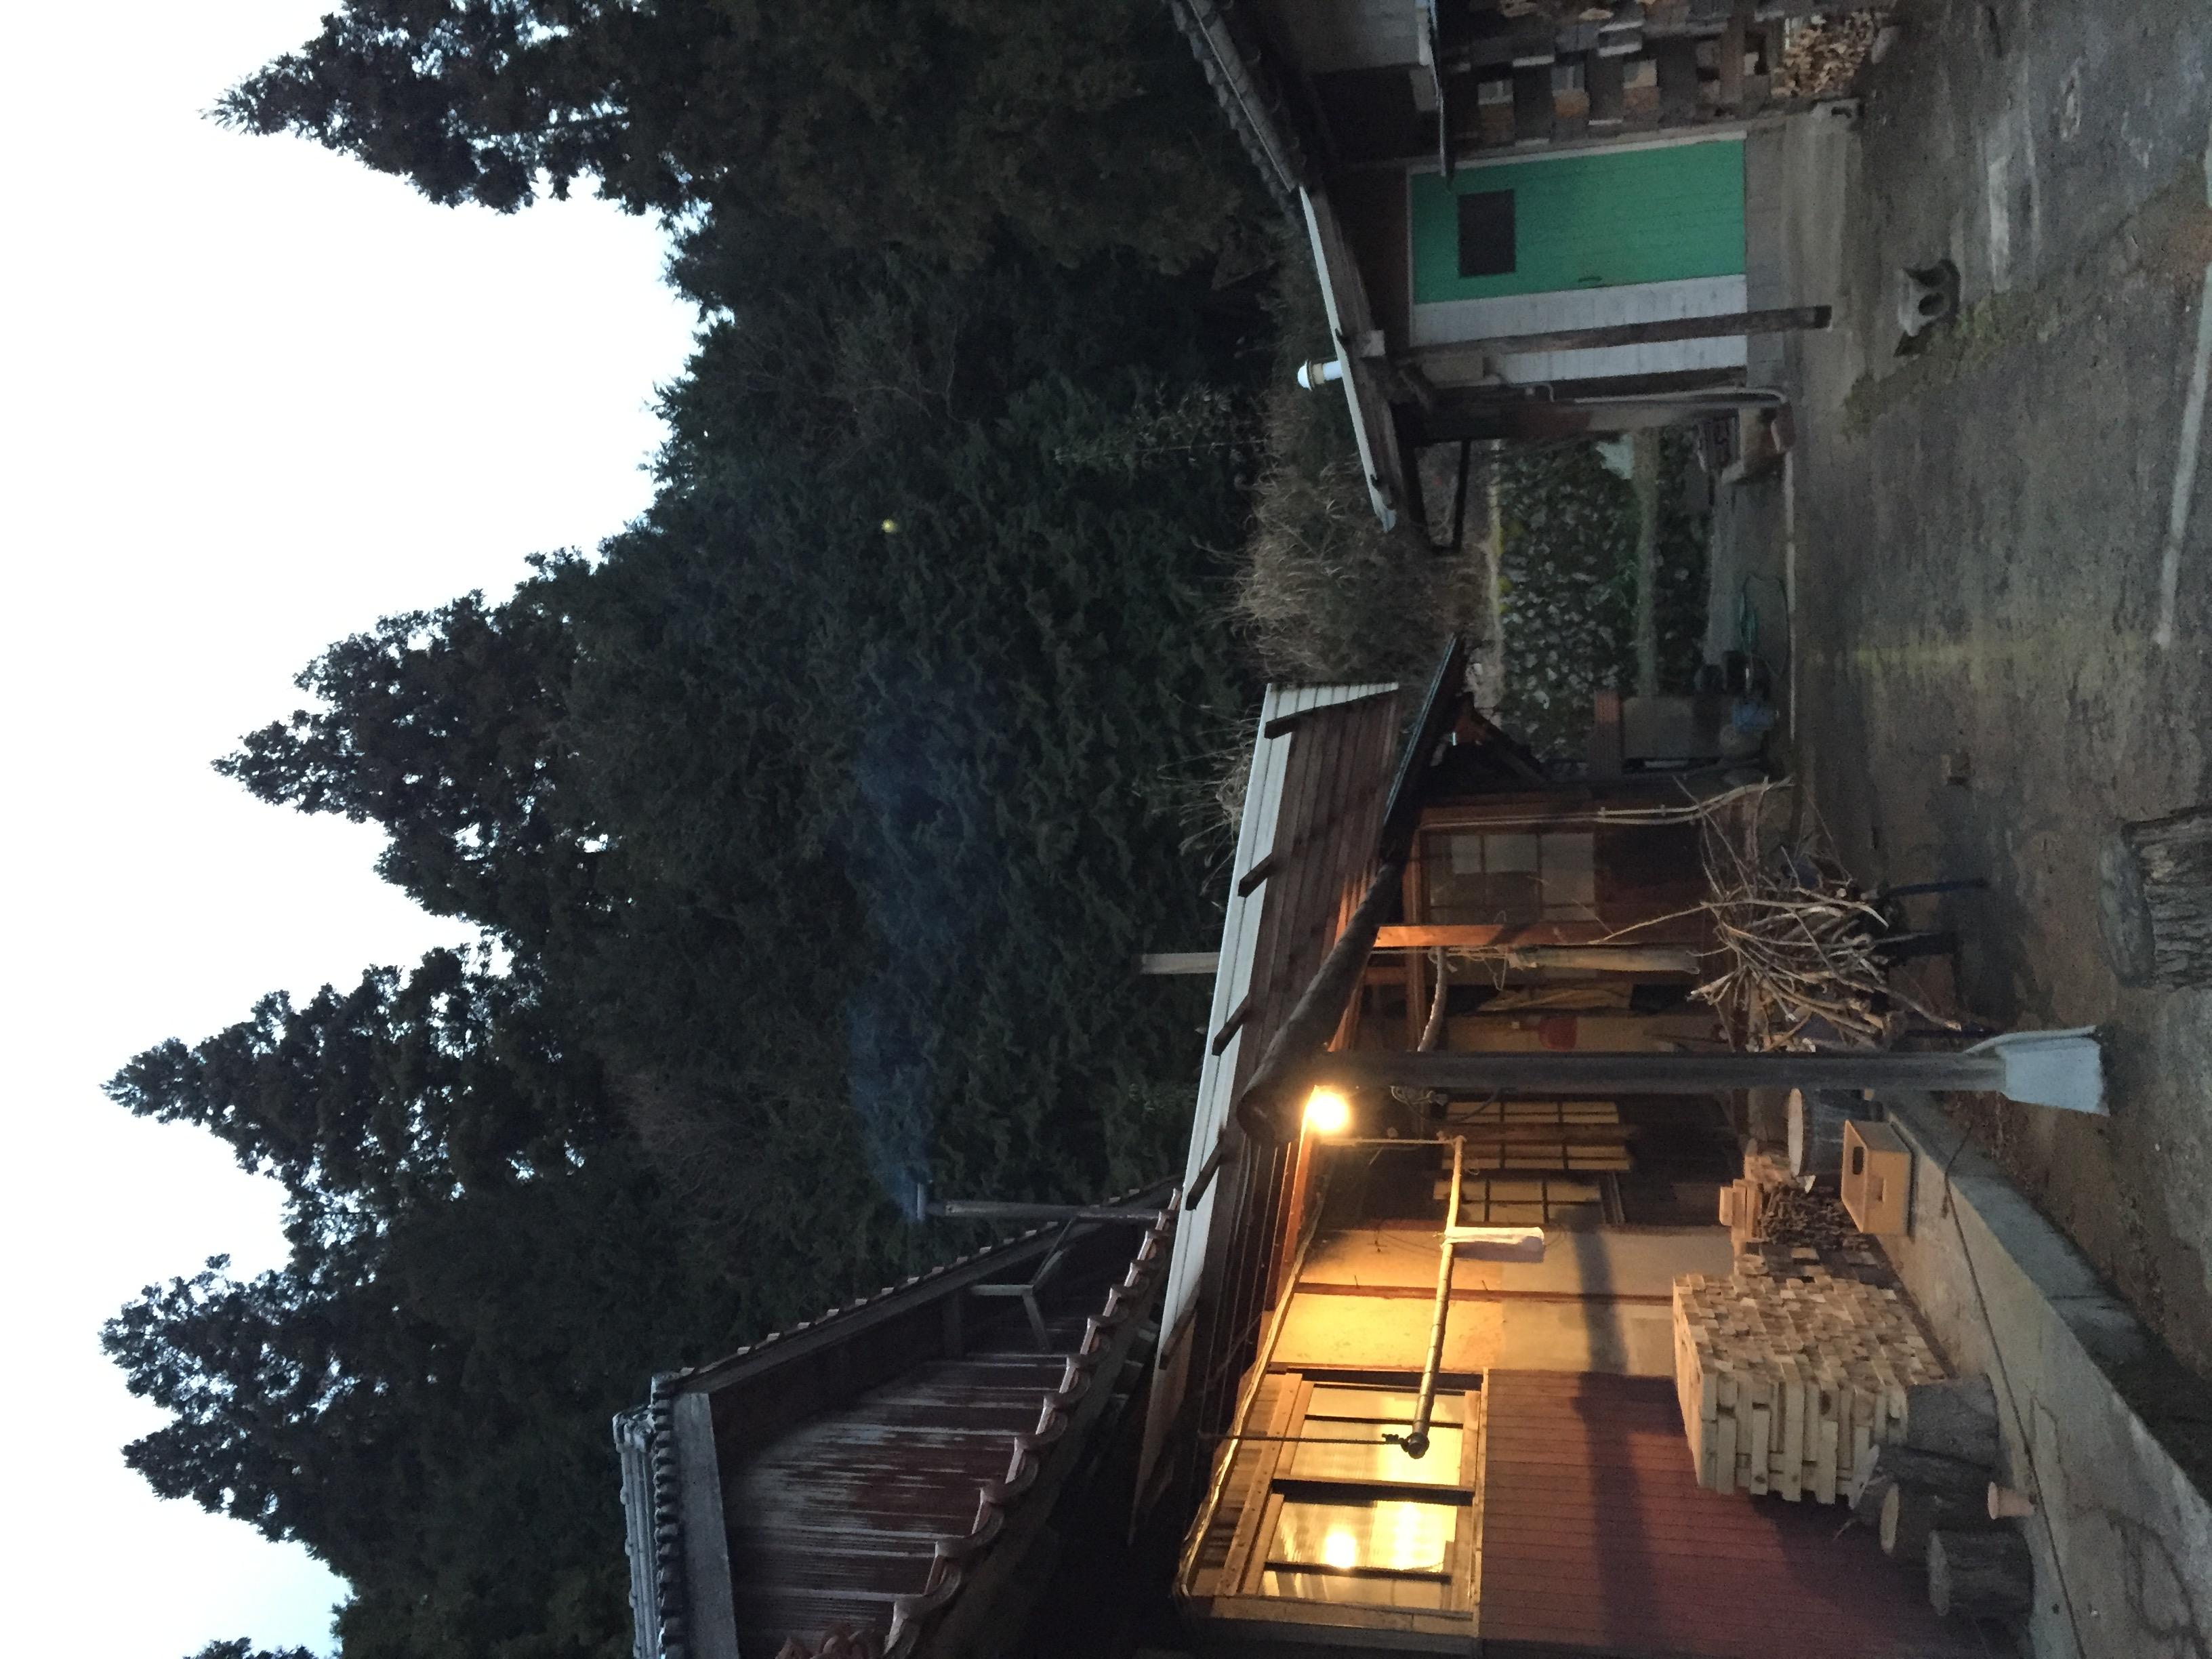 http://tomitakeiko.com/blog/2017/05/10/img02/IMG_2399.JPG